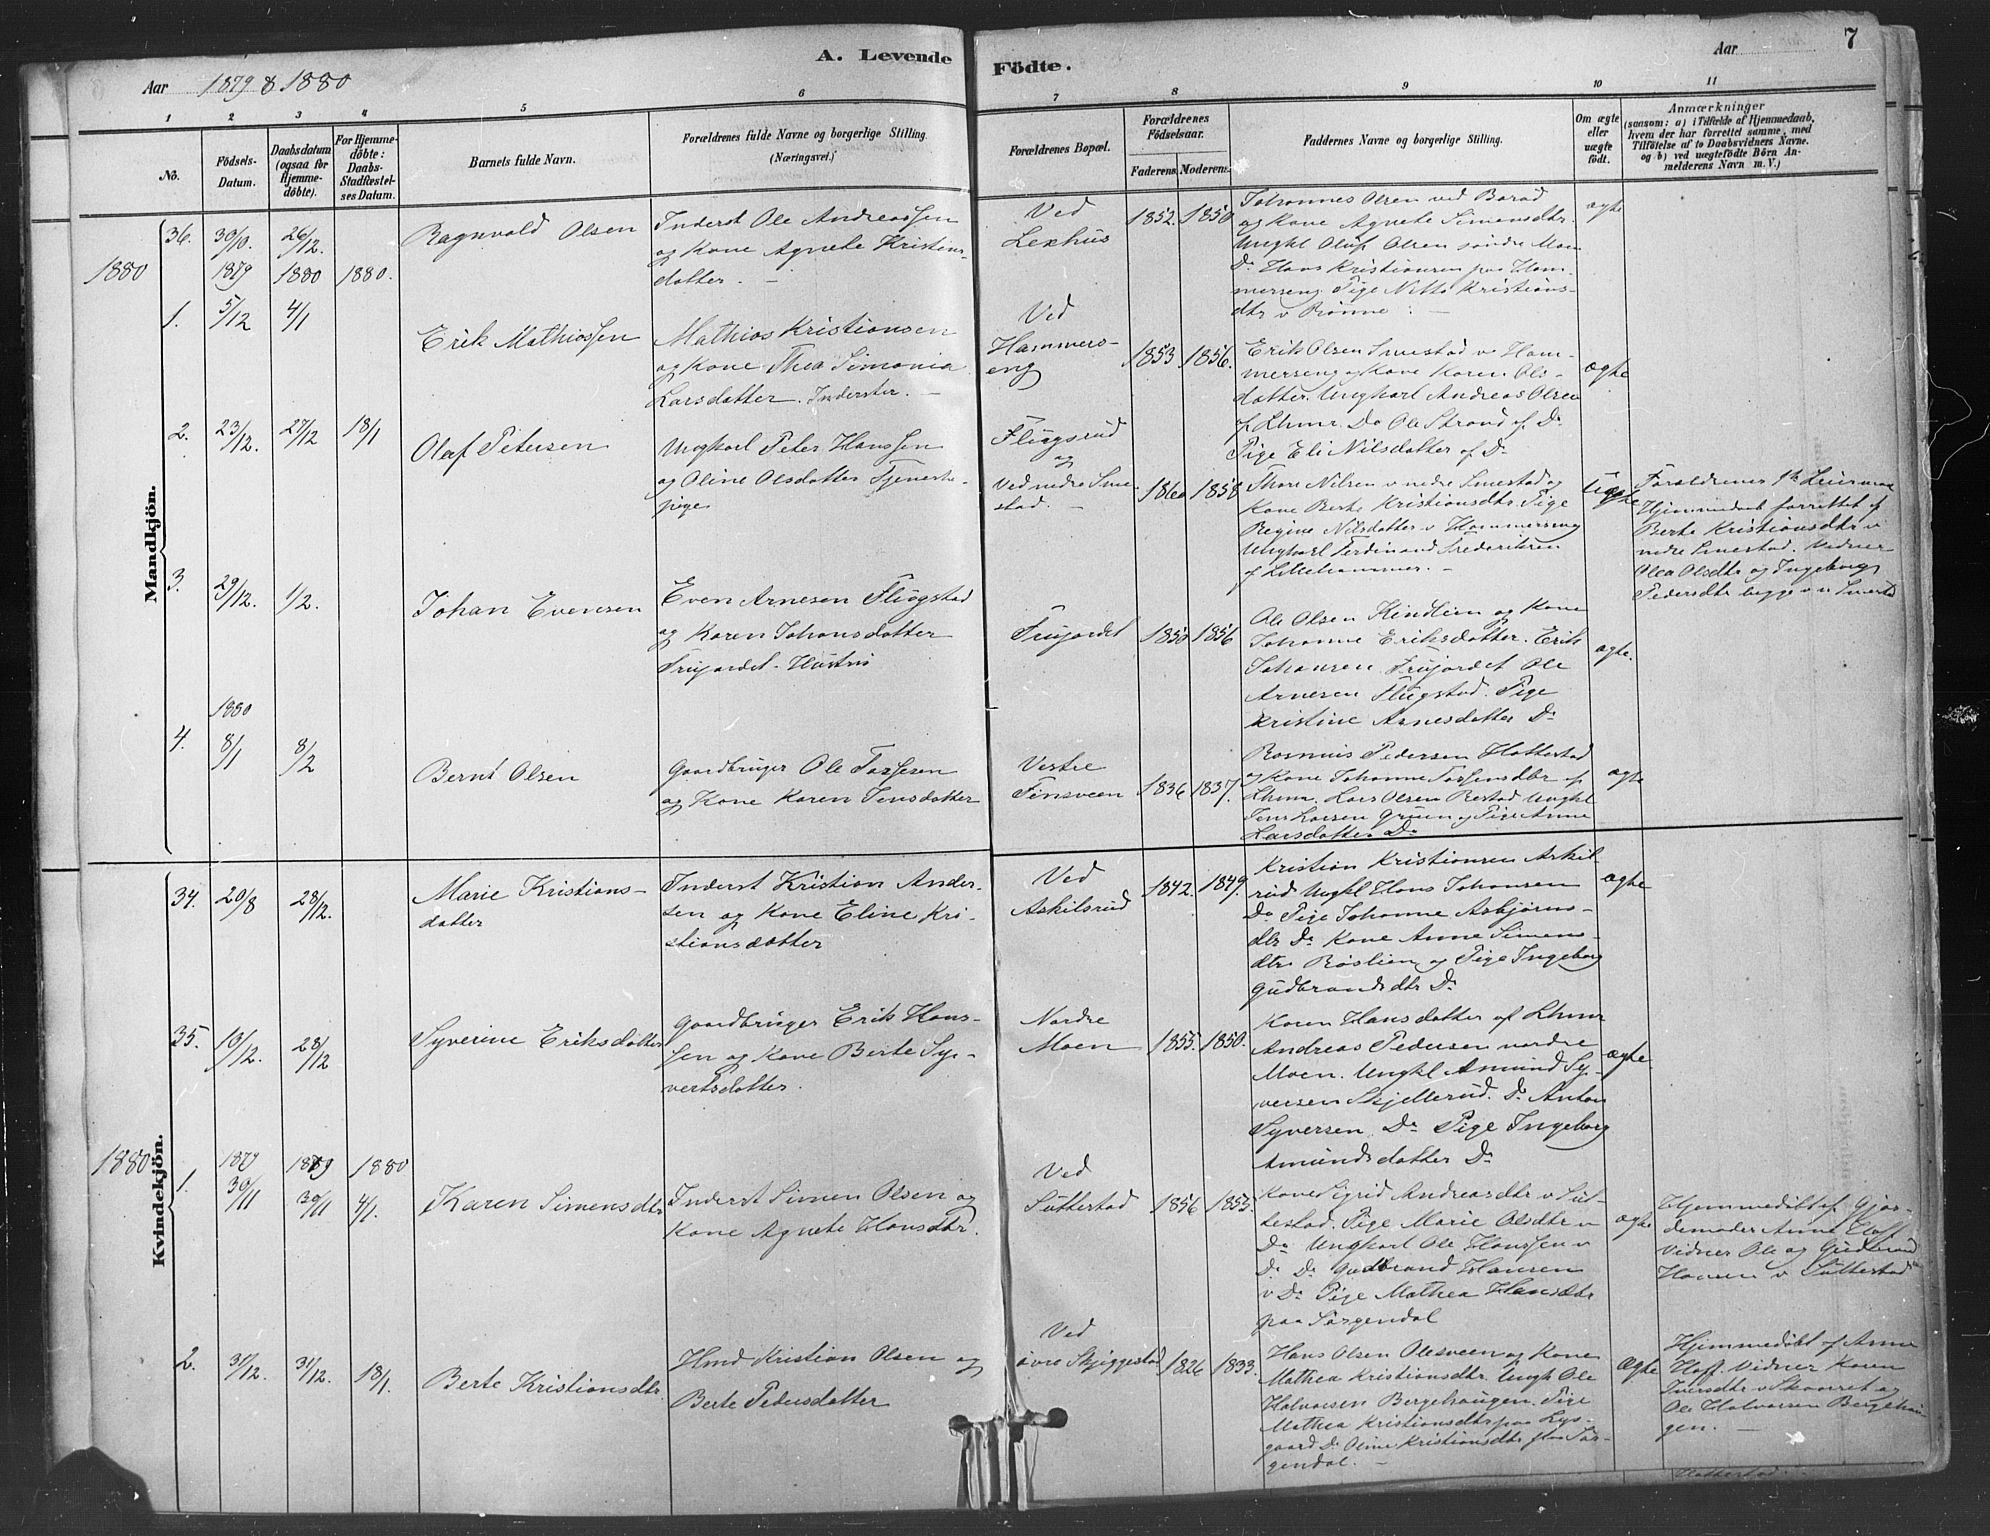 SAH, Fåberg prestekontor, Ministerialbok nr. 9, 1879-1898, s. 7